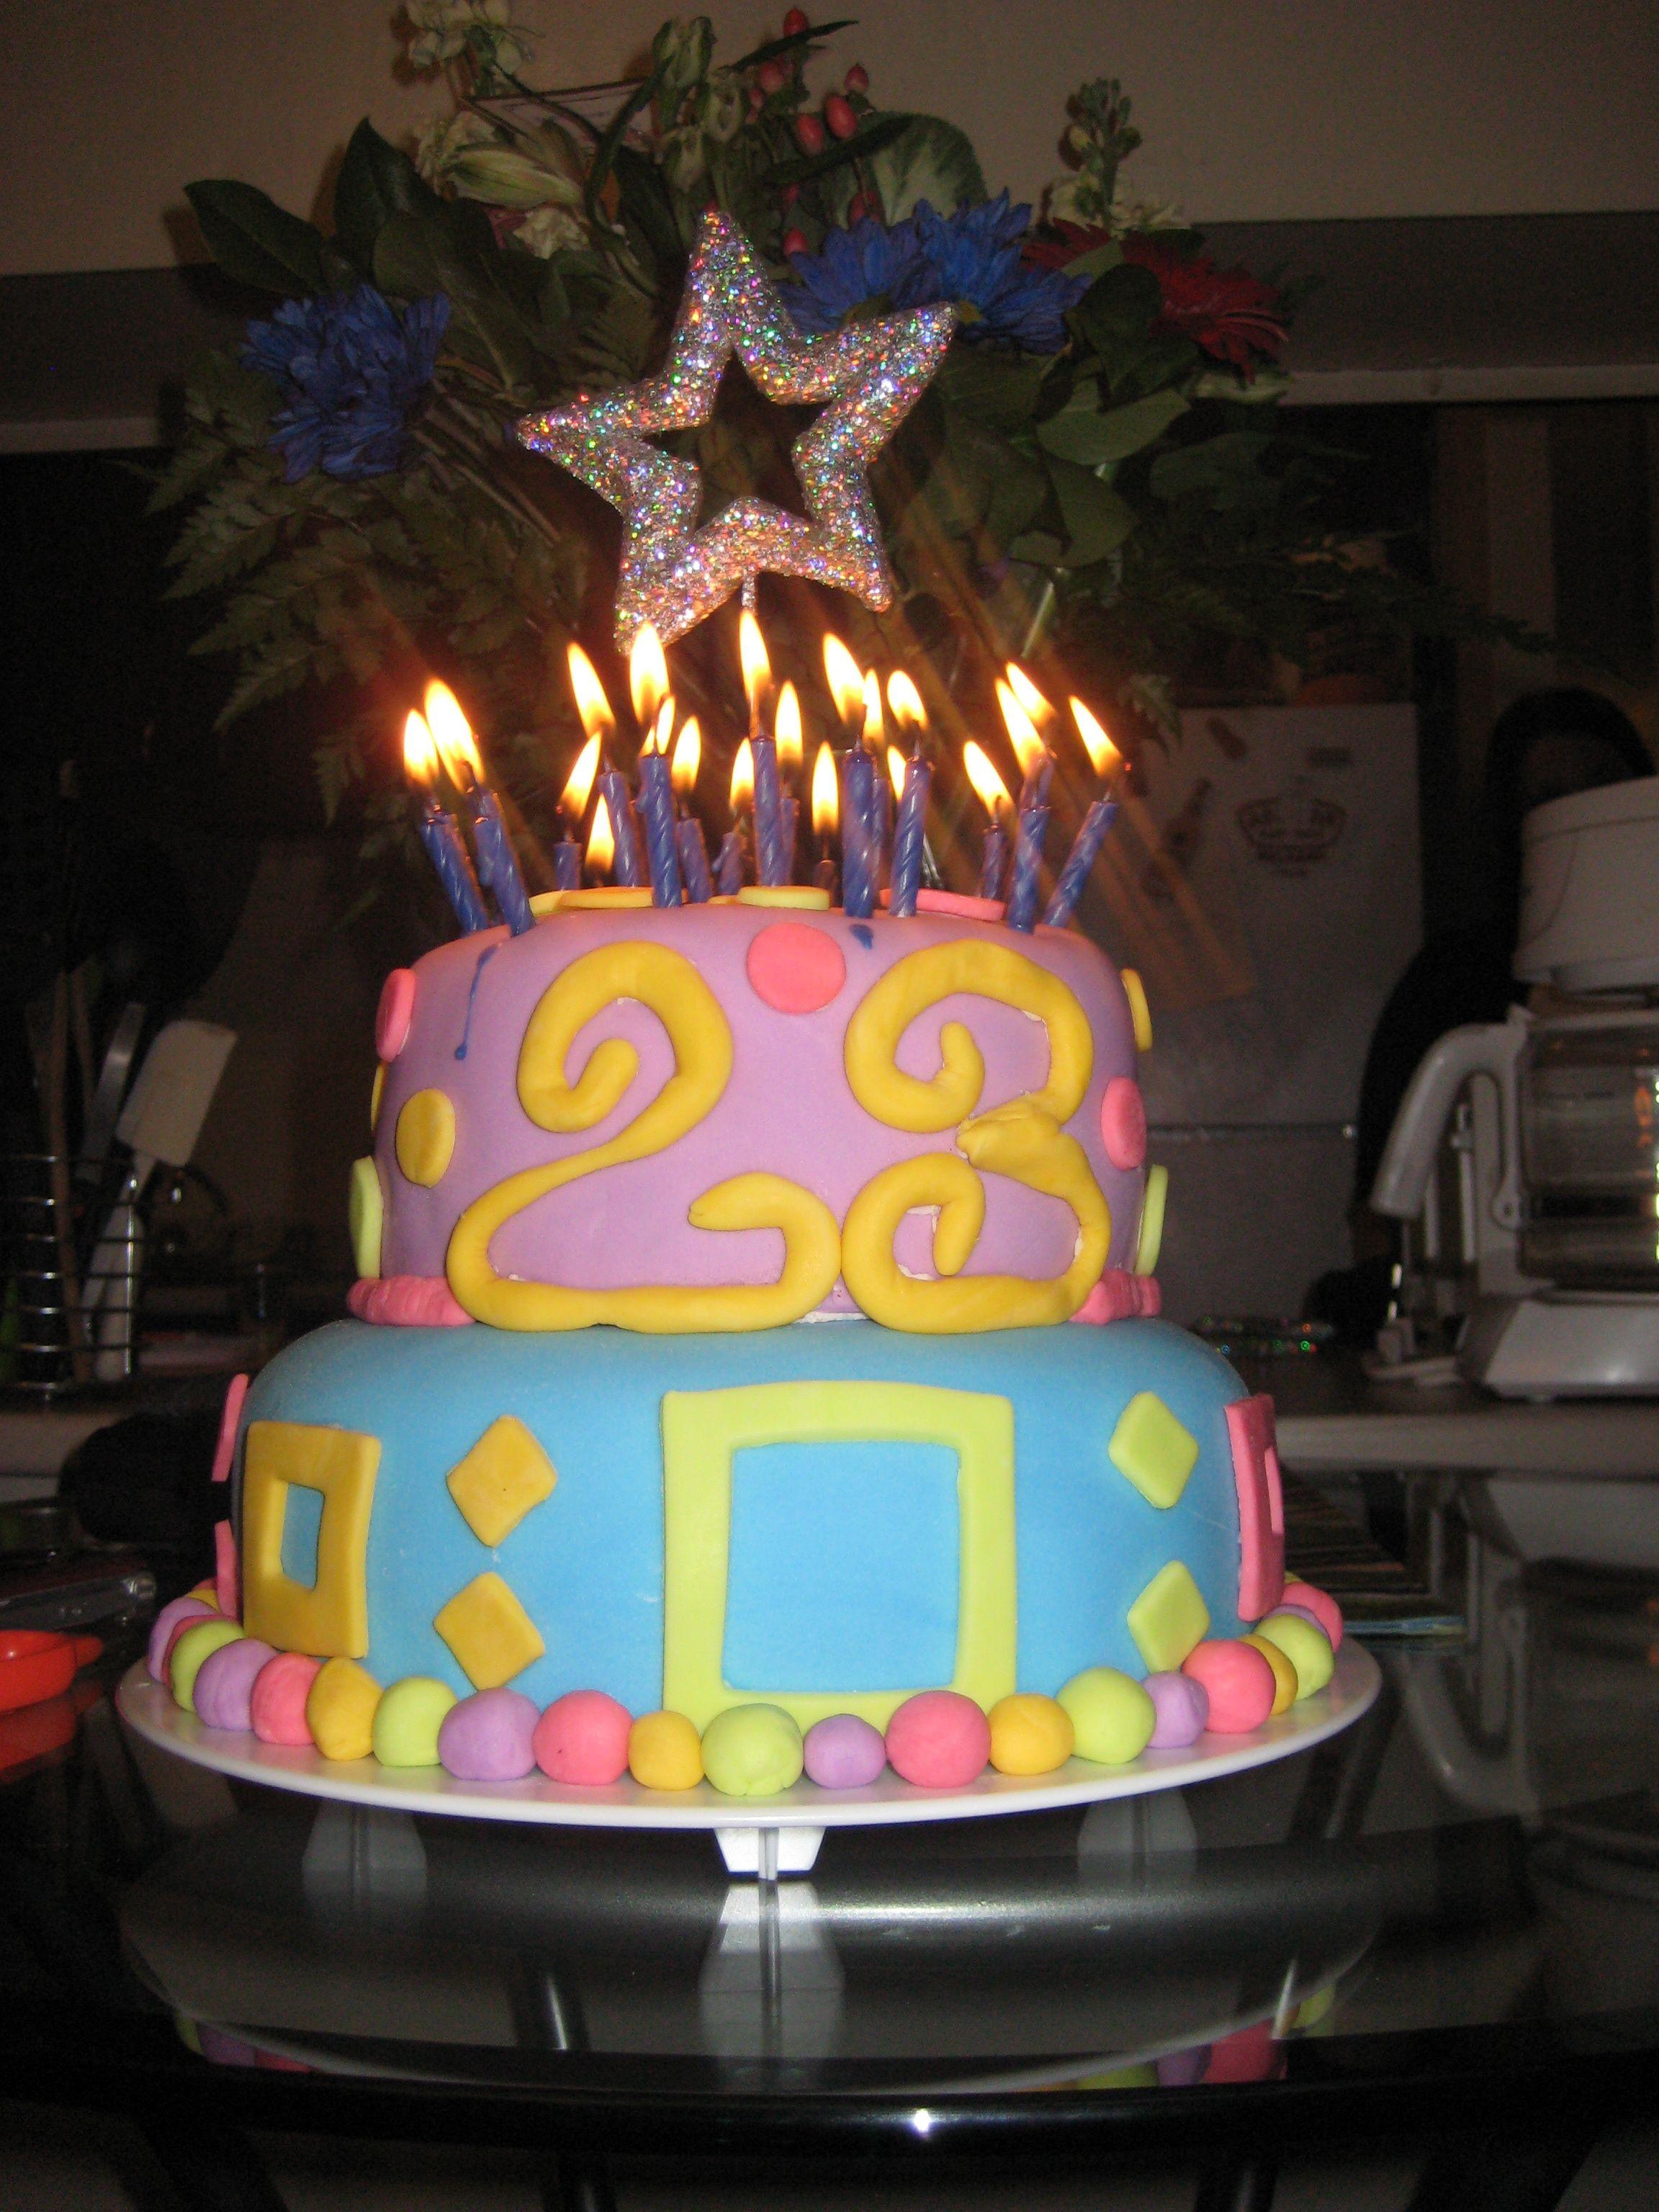 23rd birthday cake my cakes pinterest 23rd birthday cakes 23rd birthday cake thecheapjerseys Gallery